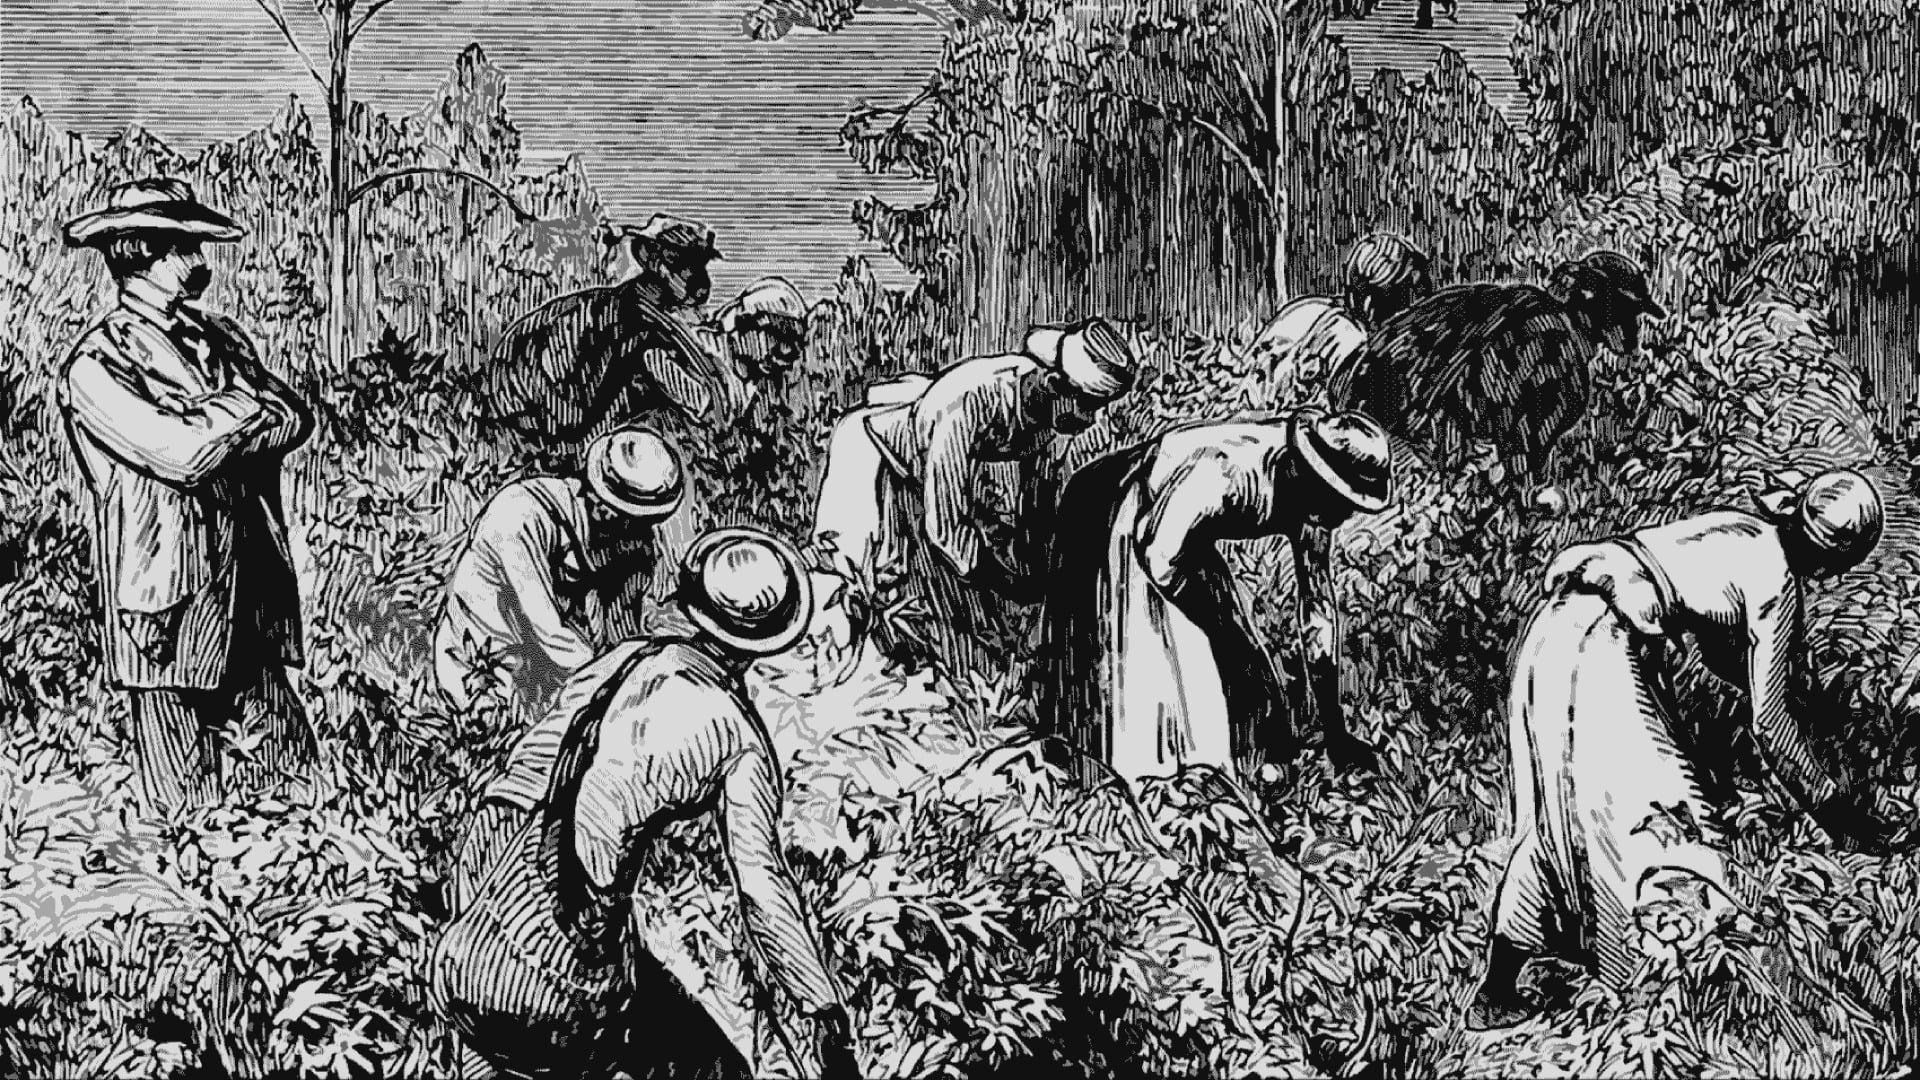 Картинки негры на плантациях